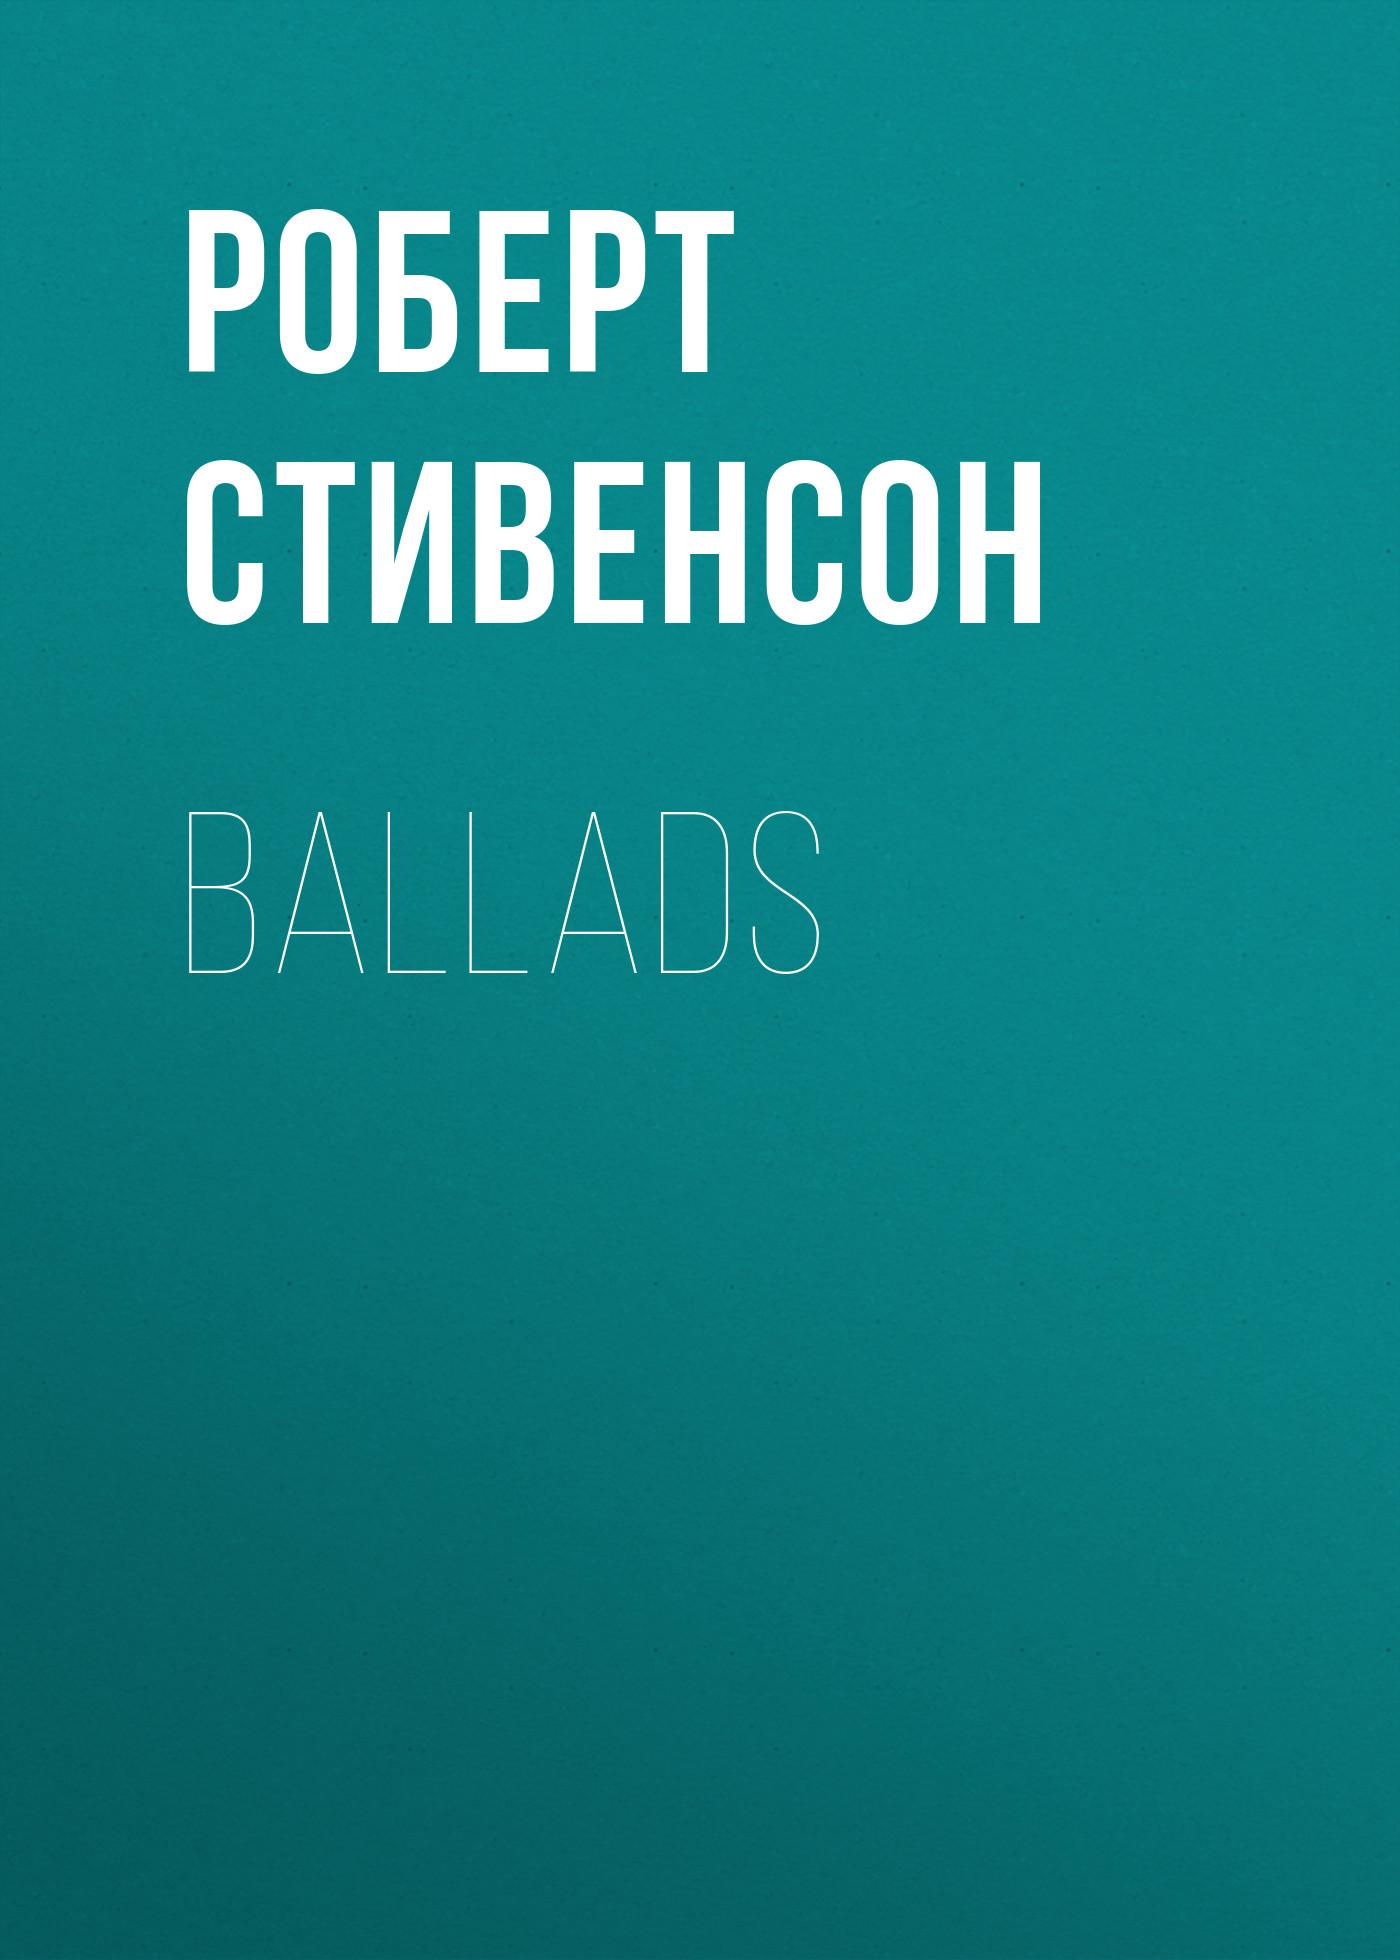 Роберт Льюис Стивенсон Ballads роберт льюис стивенсон tales and fantasies